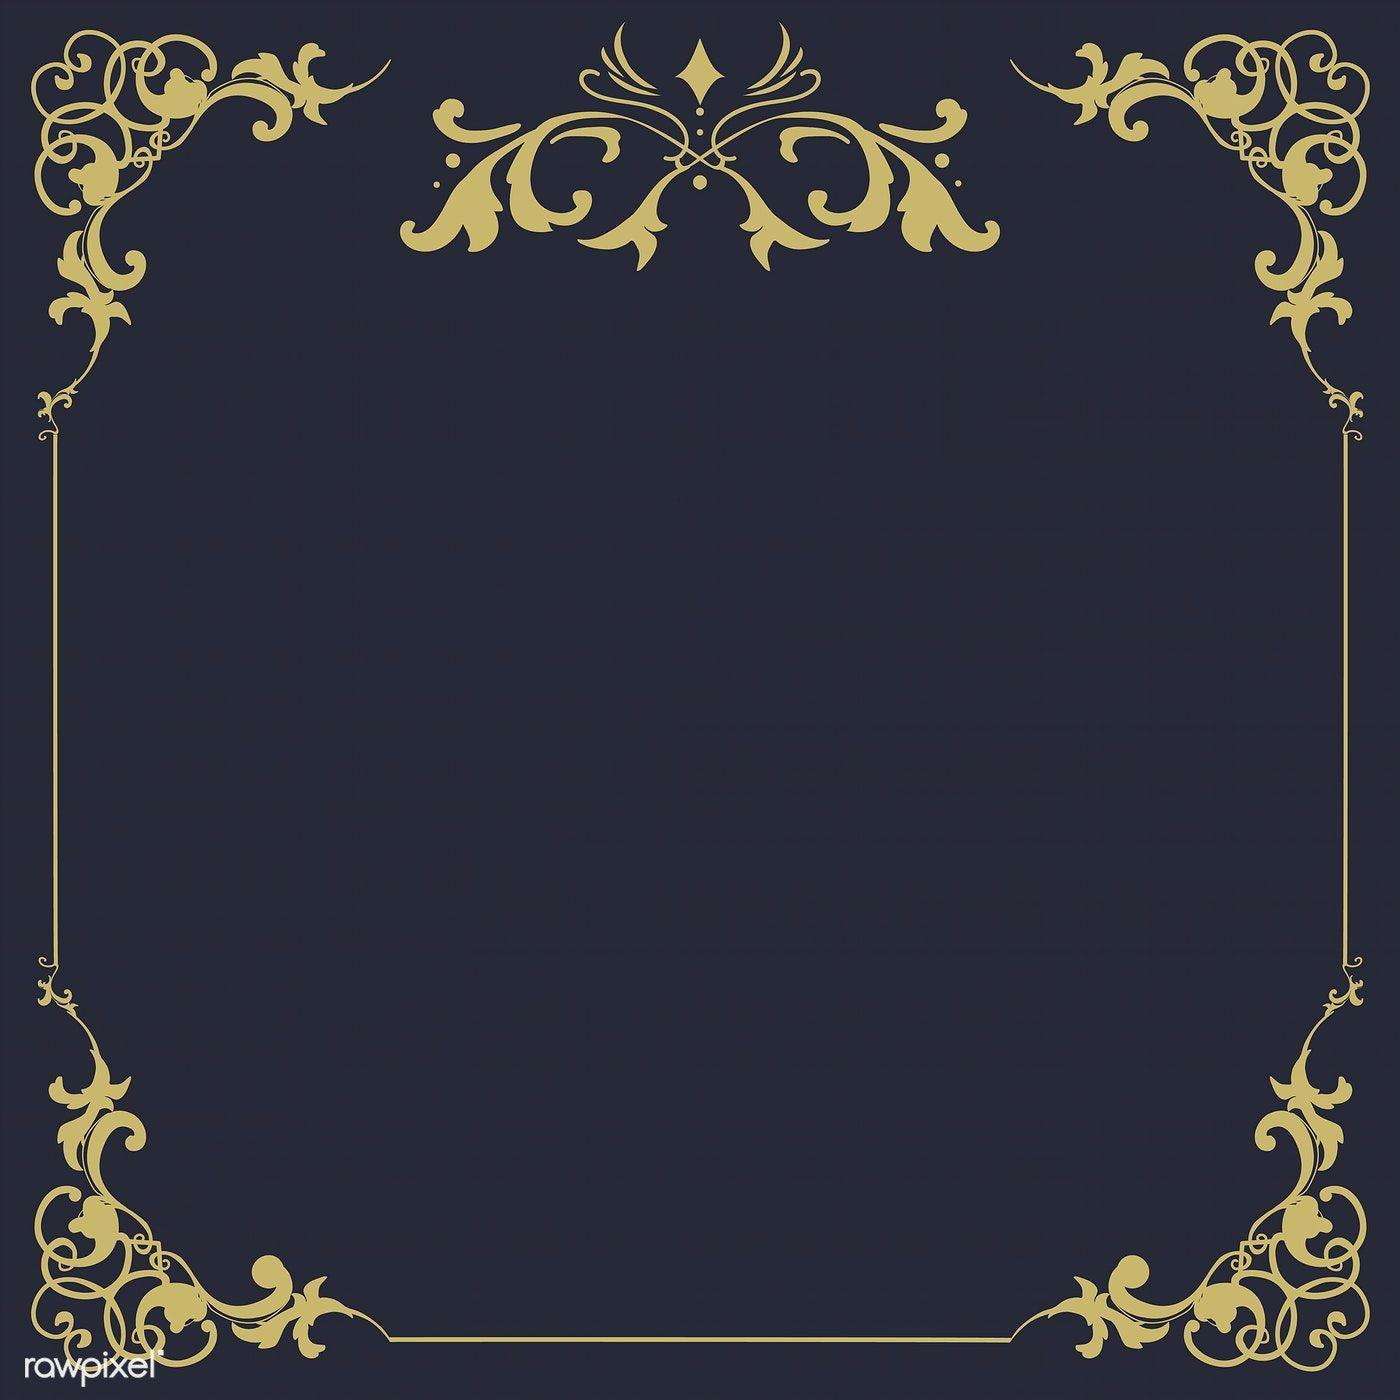 Download Premium Vector Of Vintage Flourish Ornament Frame Vector 511161 Ornament Frame Vector Art Design Gold And Black Background